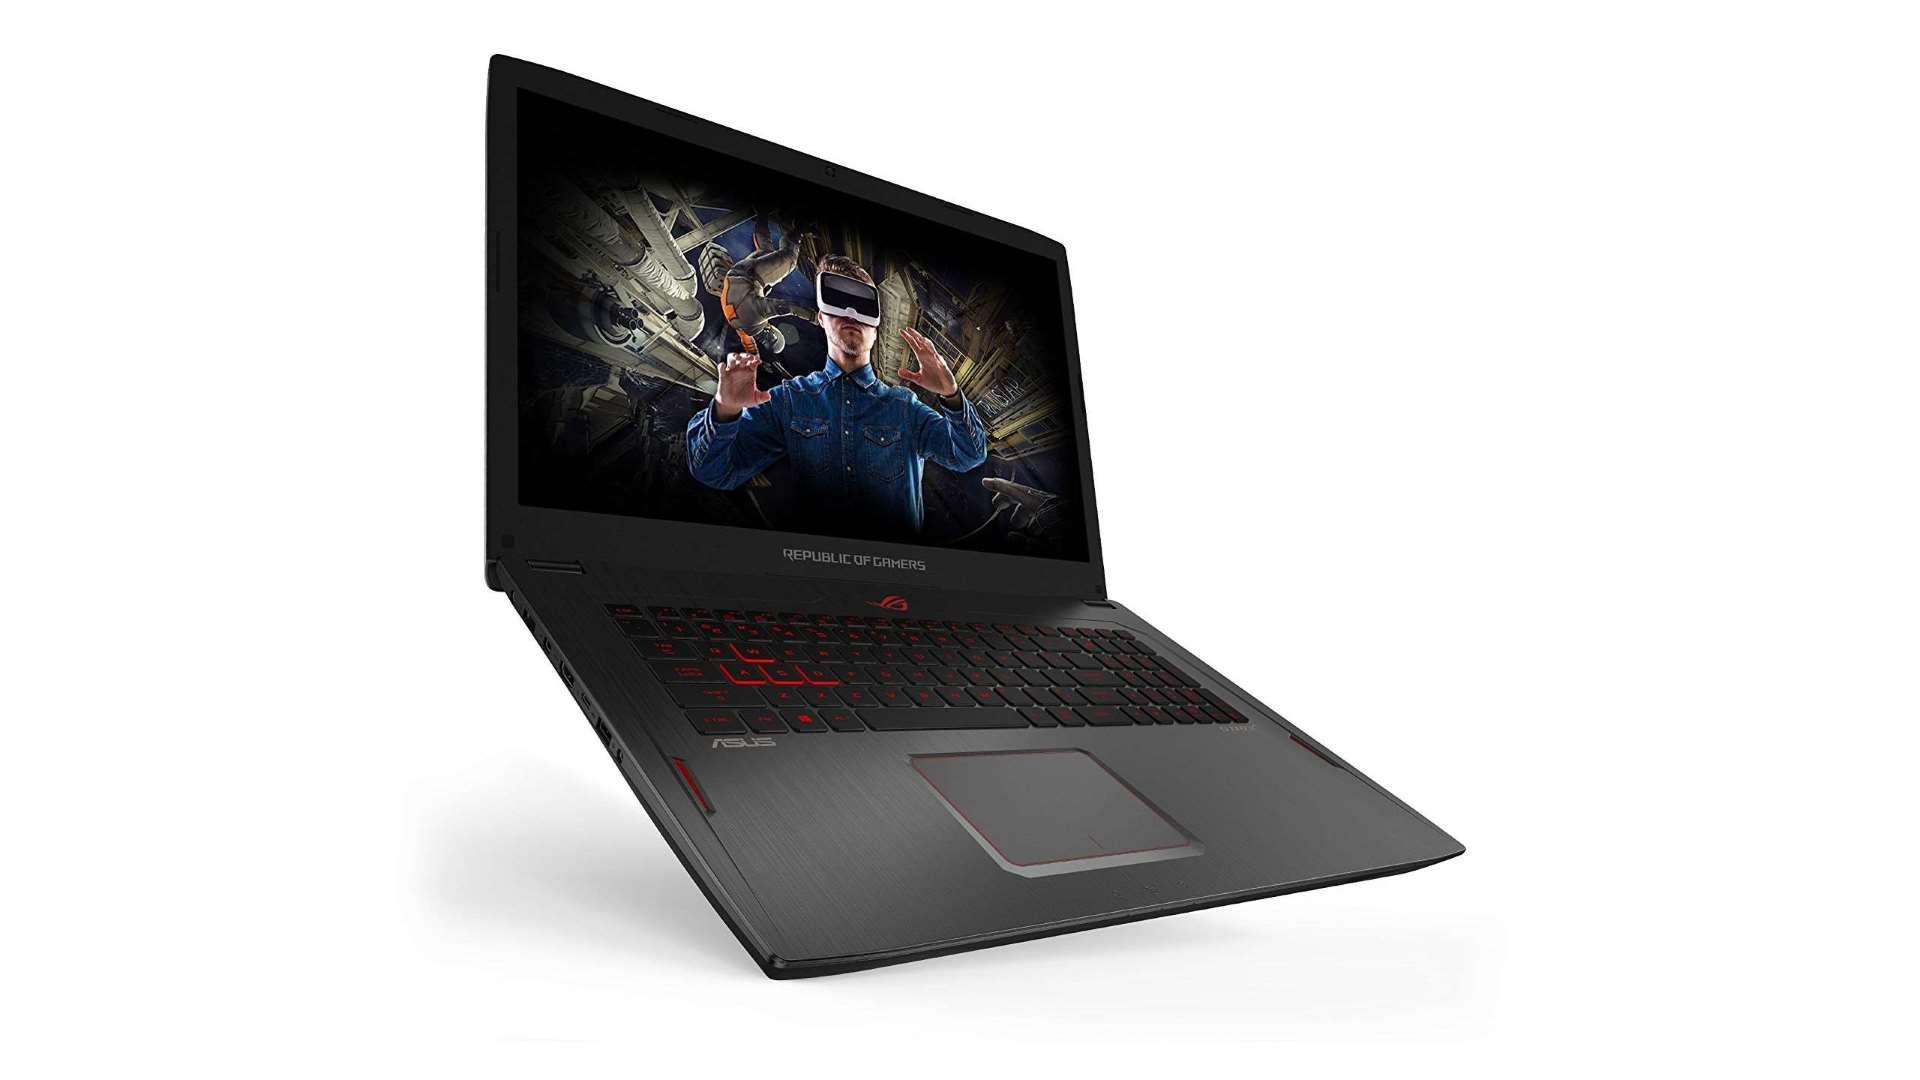 Amd S Laptop Market Share Jumps As Intel S Cpu Supply Woes Worsen Pcgamesn